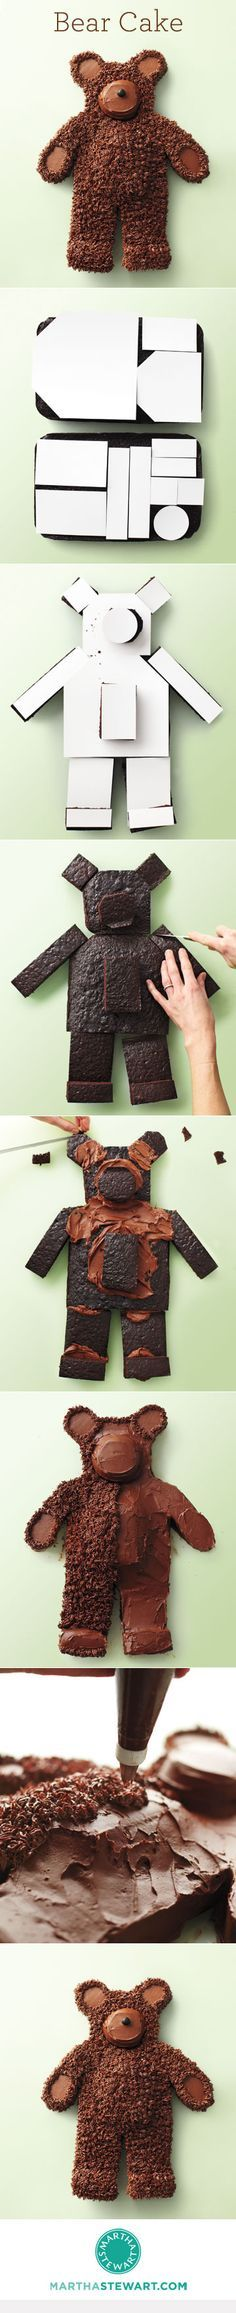 Beary cute cake #firstbirthday #bearcake #teddybear